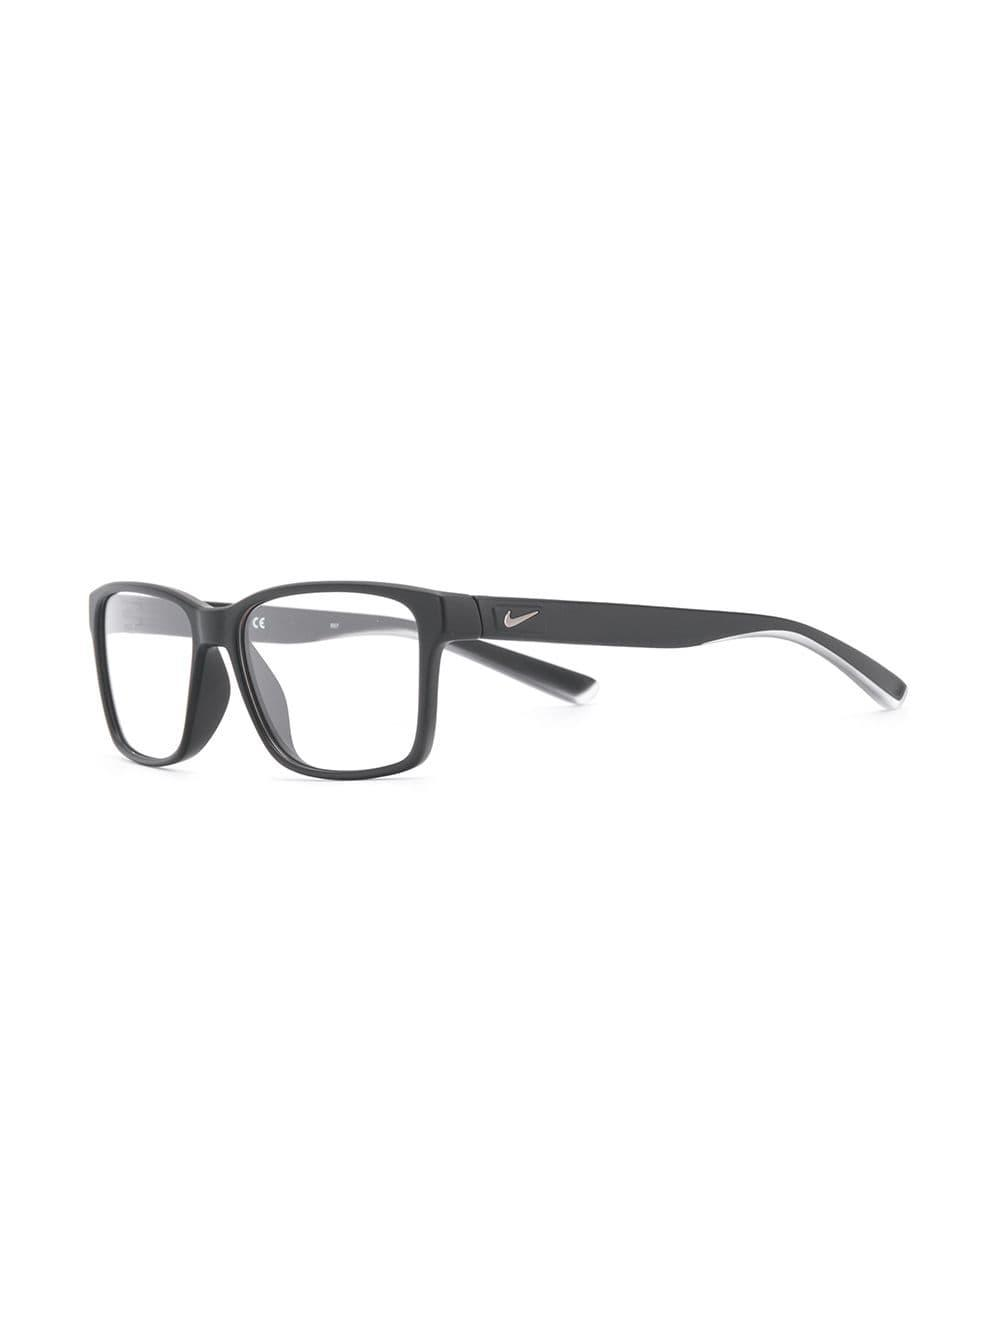 b28d200fa24 Nike 7091 Glasses in Black - Lyst